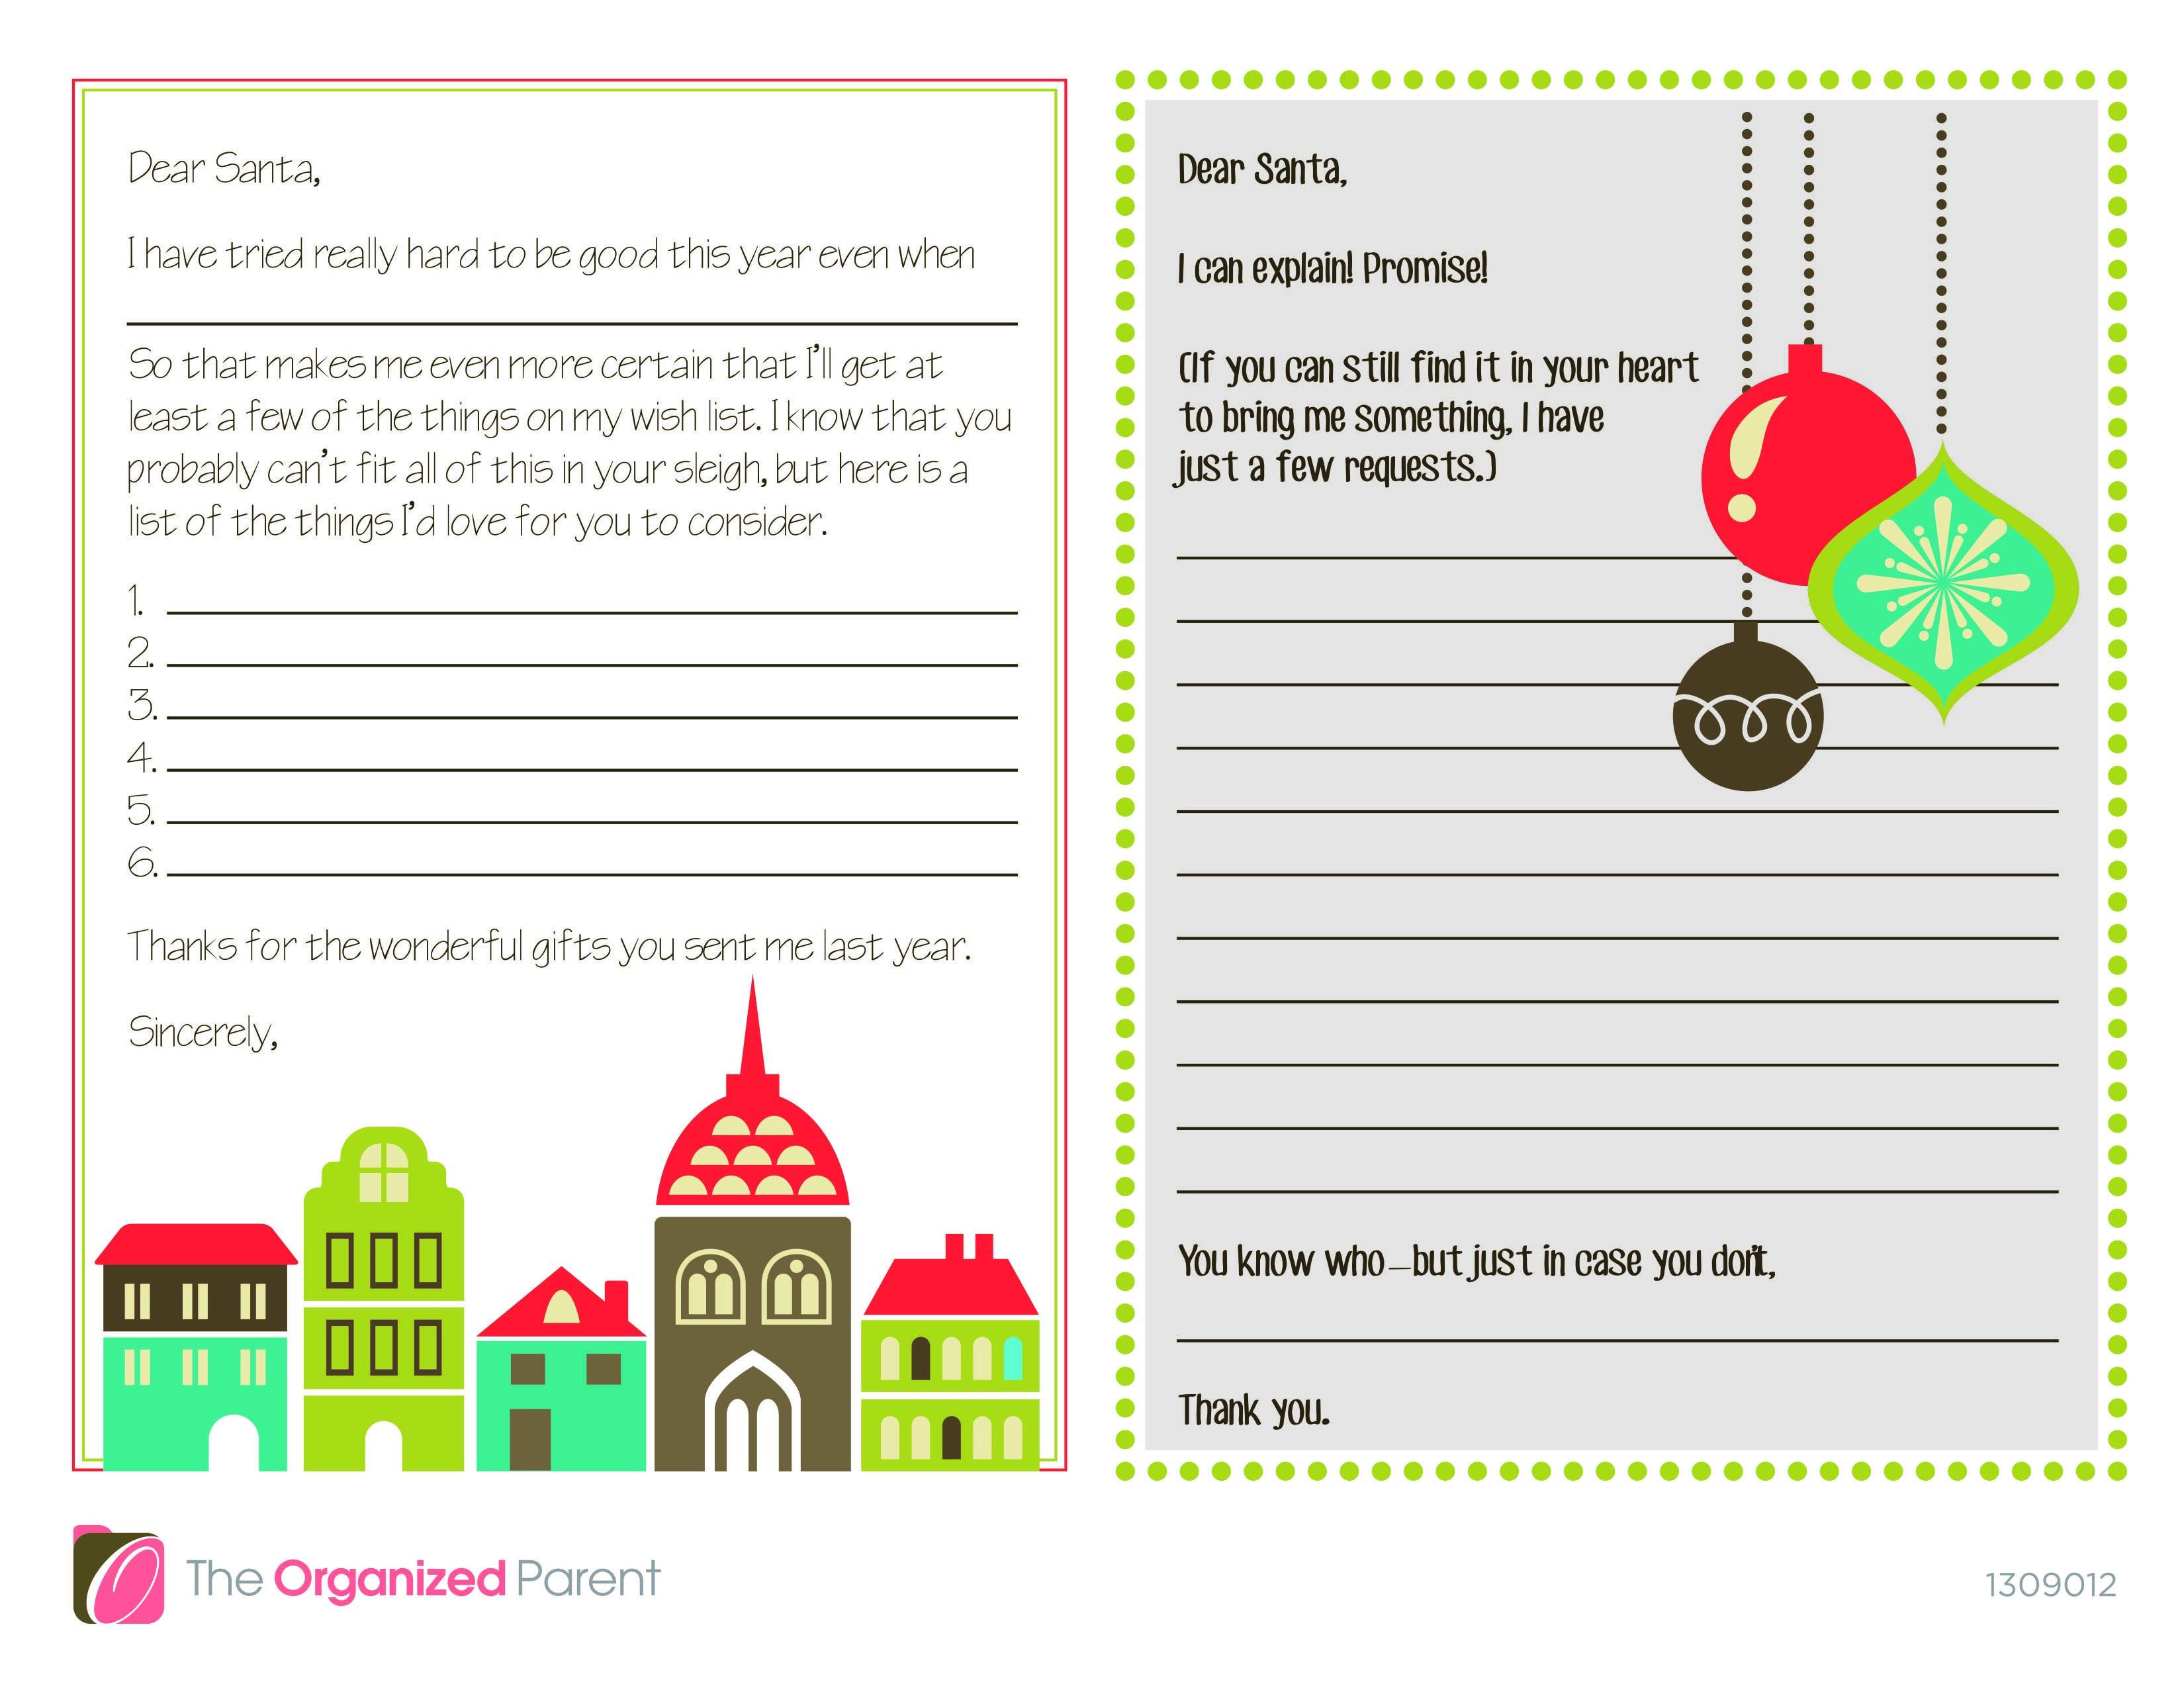 Printable Dear Santa Letters for your little ones. Dear